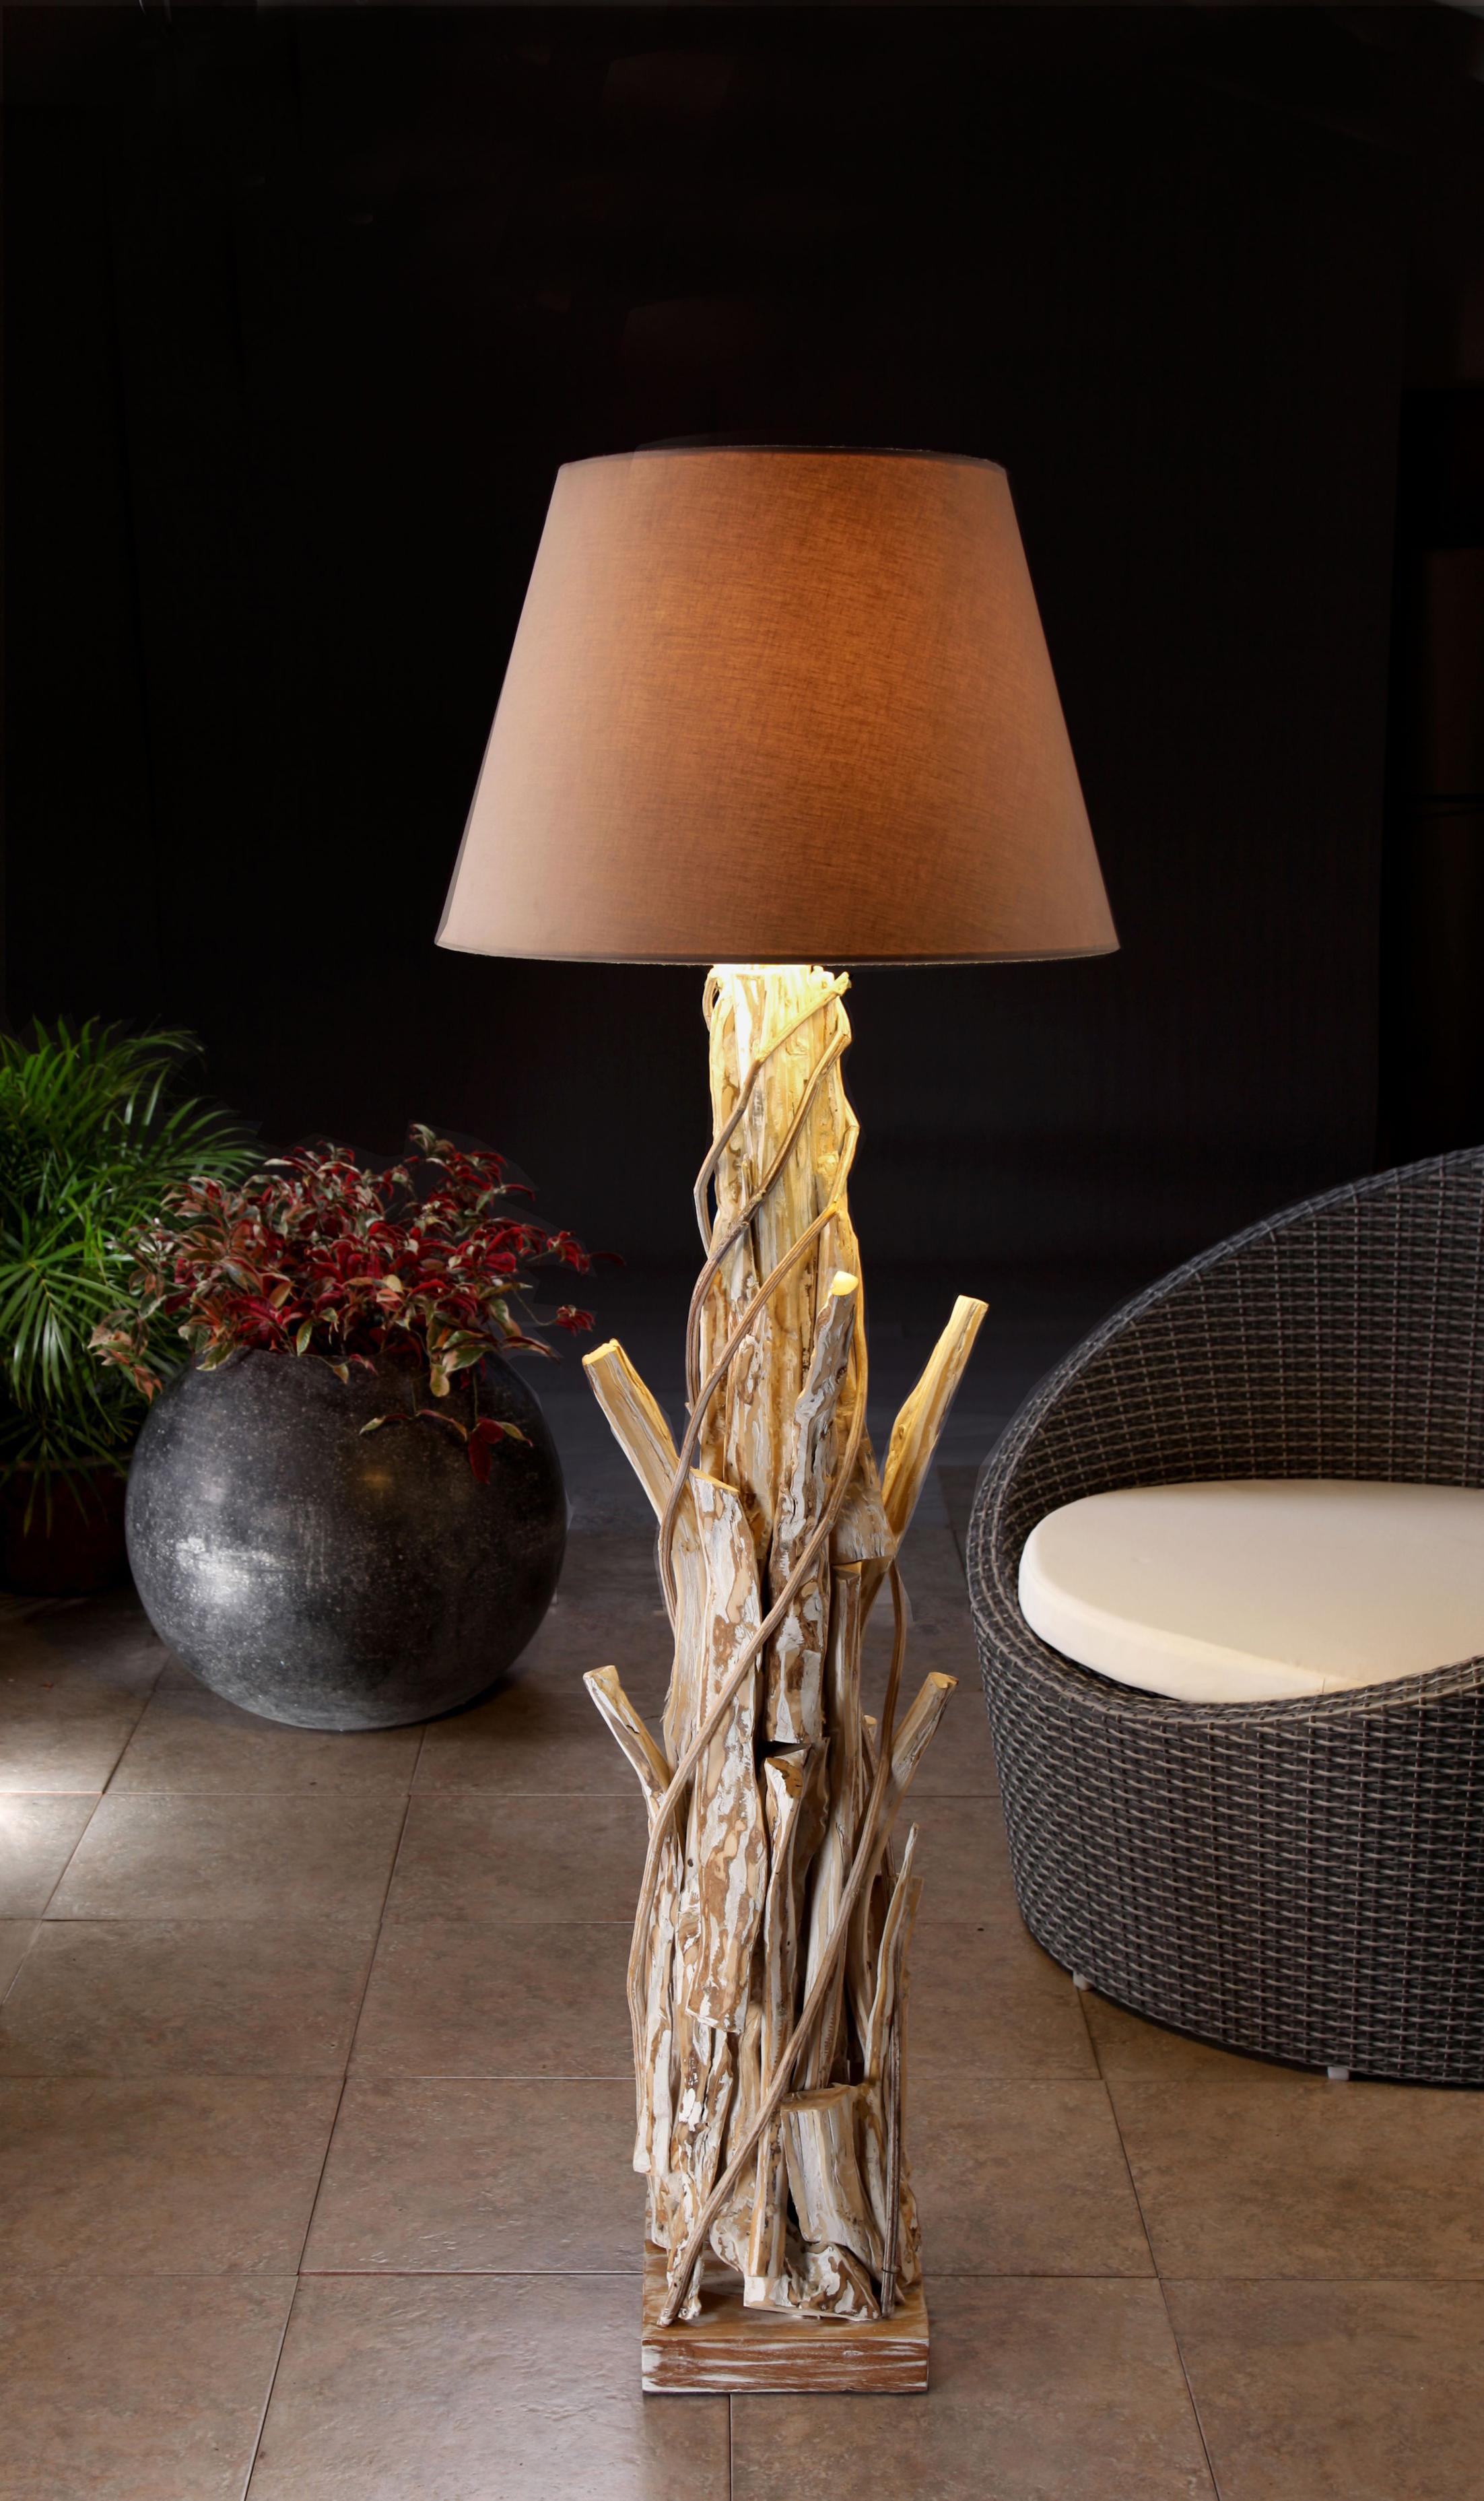 m bel aus treibholz galerie zeba galerie zeba. Black Bedroom Furniture Sets. Home Design Ideas